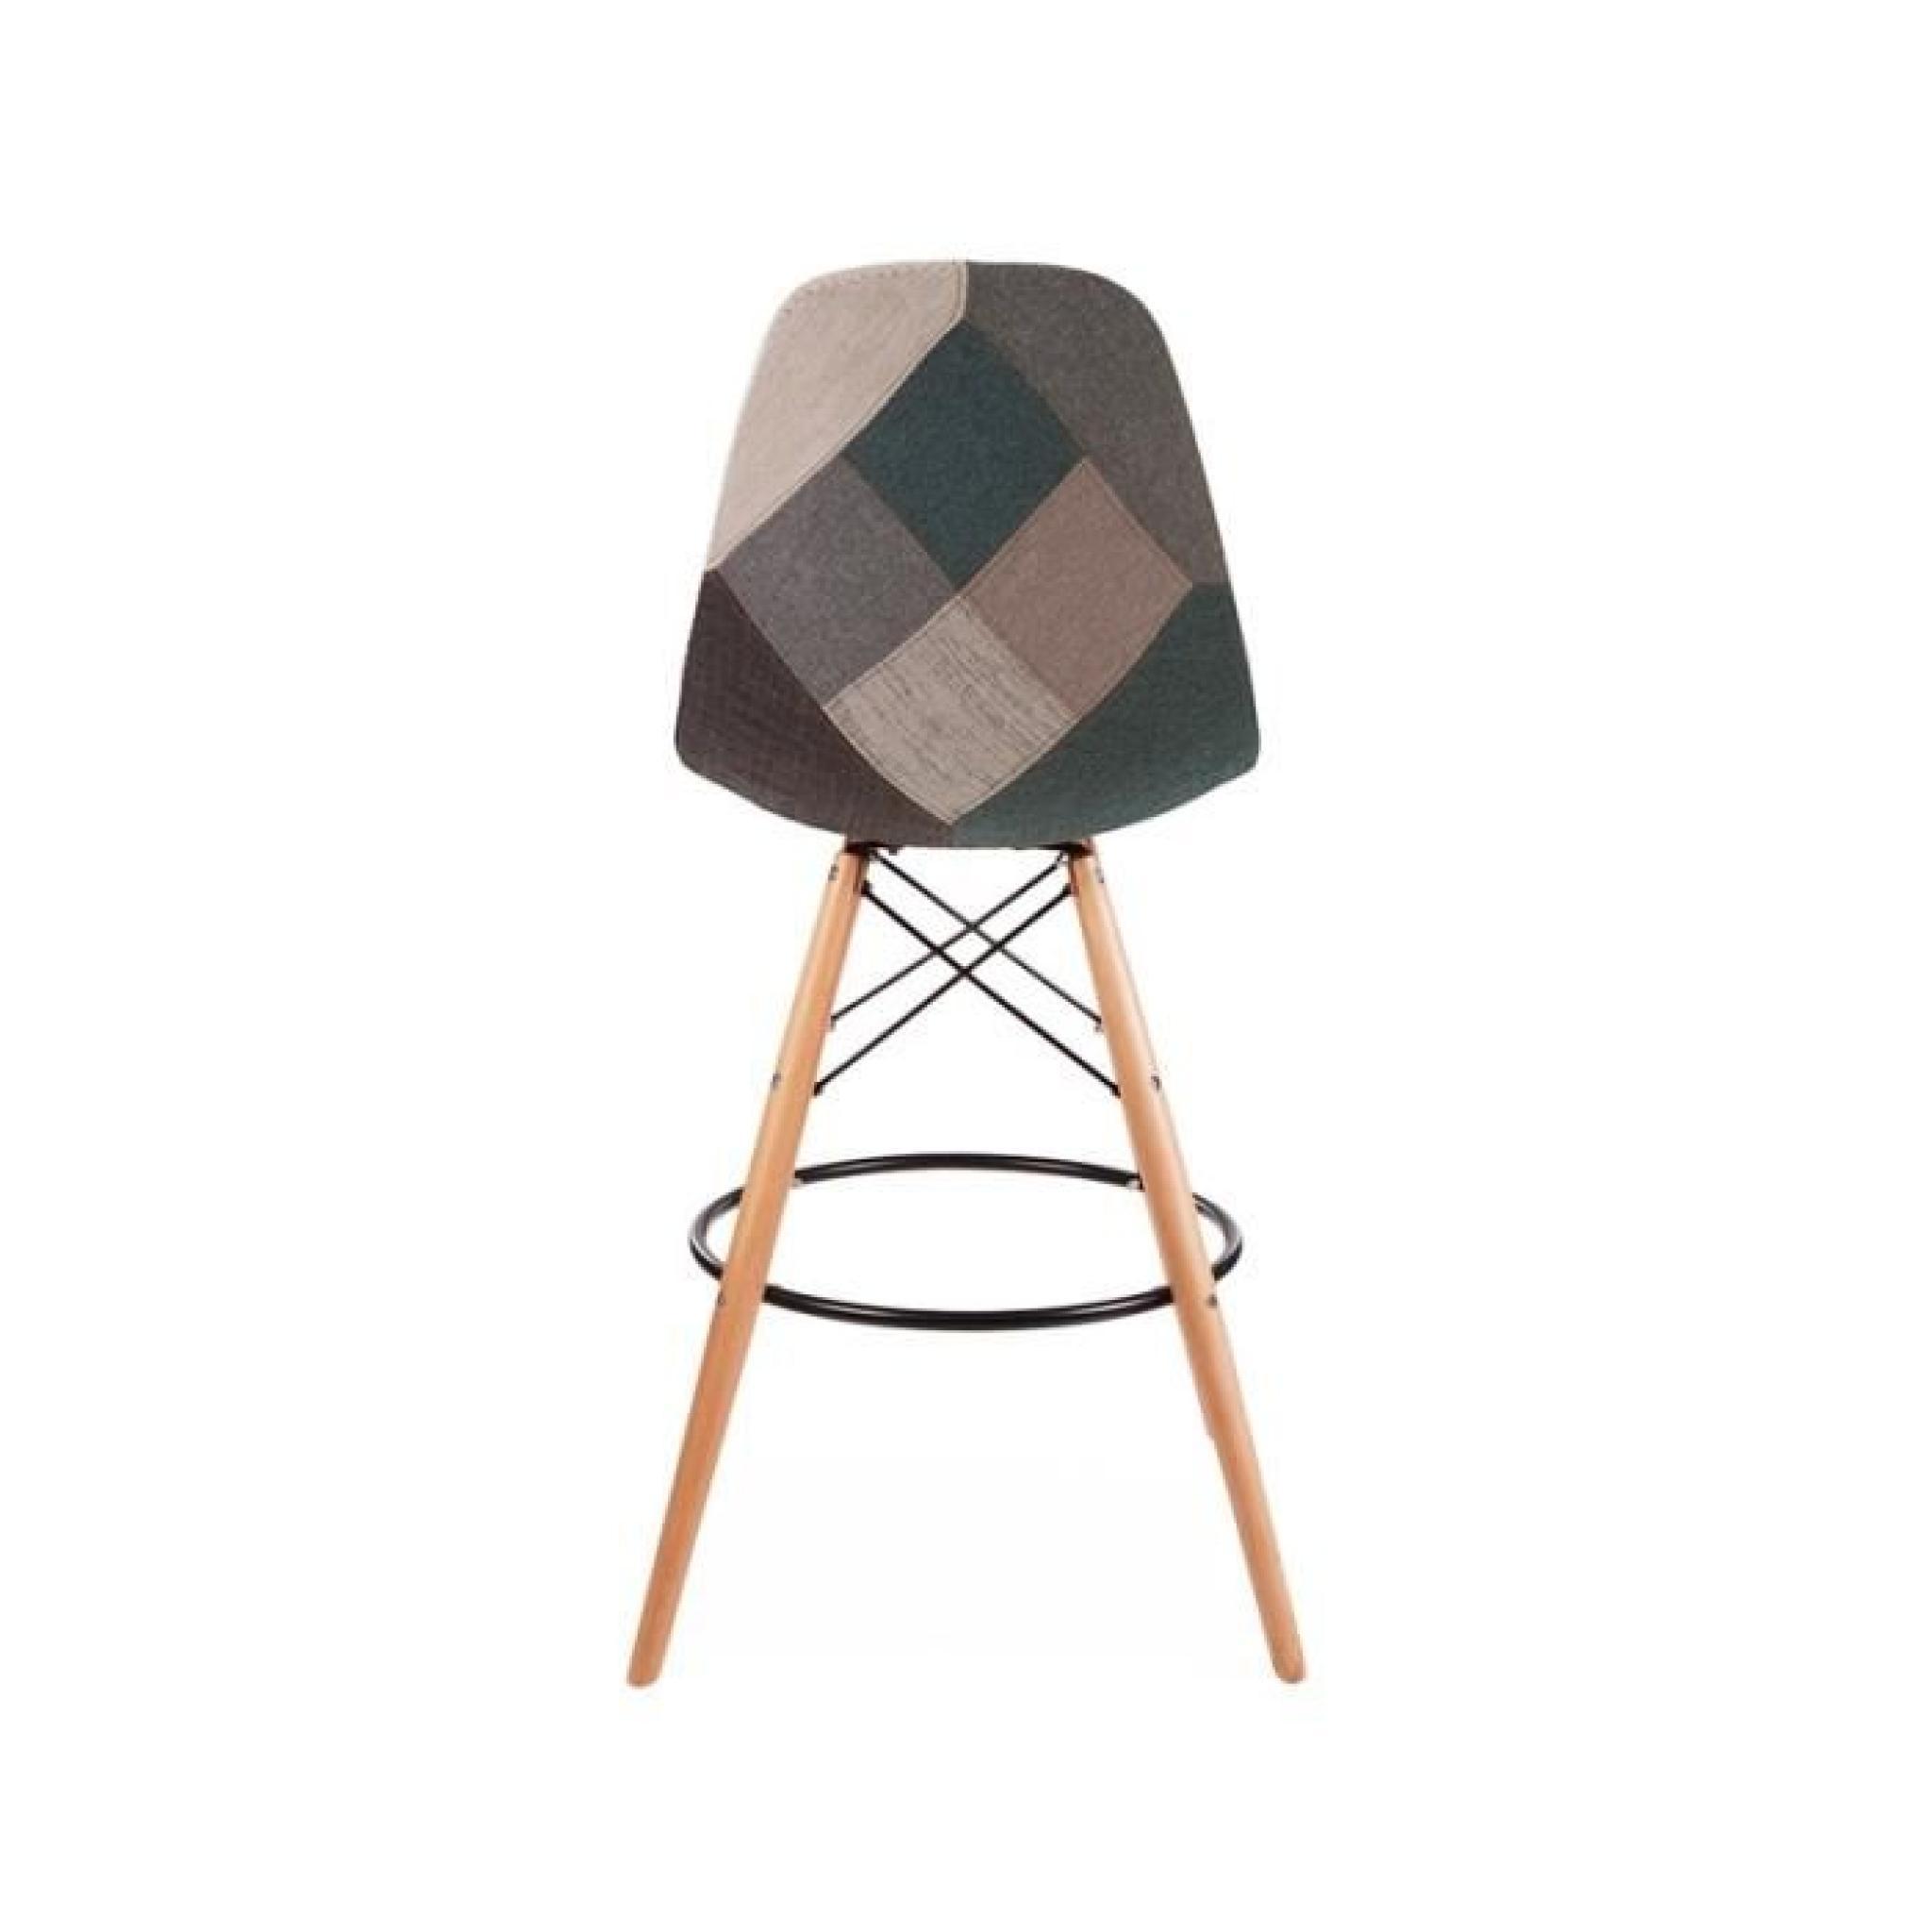 tabouret de bar patchwork mobilier design d coration d 39 int rieur. Black Bedroom Furniture Sets. Home Design Ideas